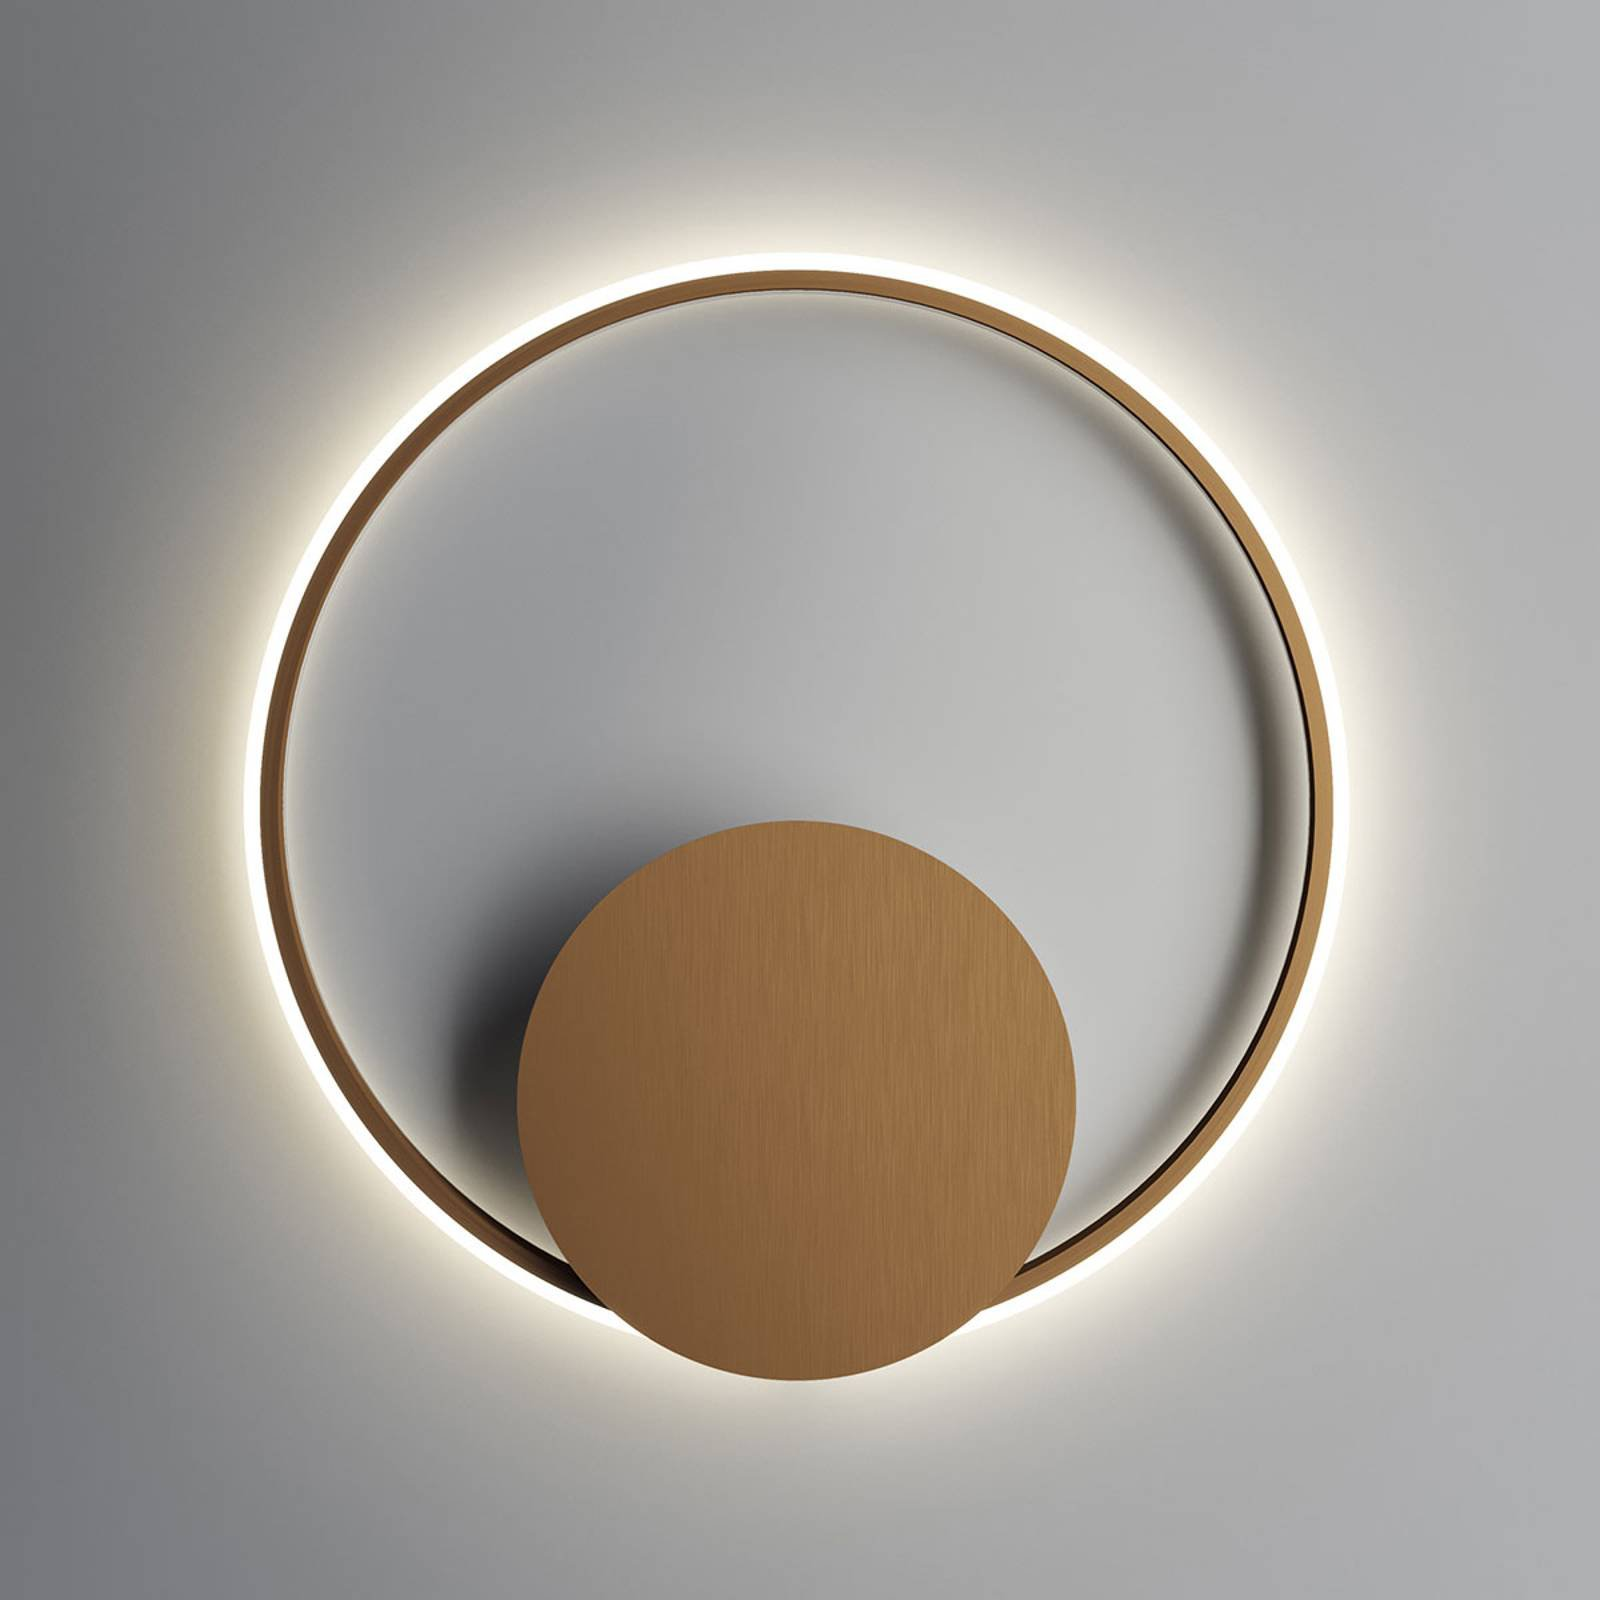 Fabbian Olympic LED-vegglampe Ø 60 cm, bronse